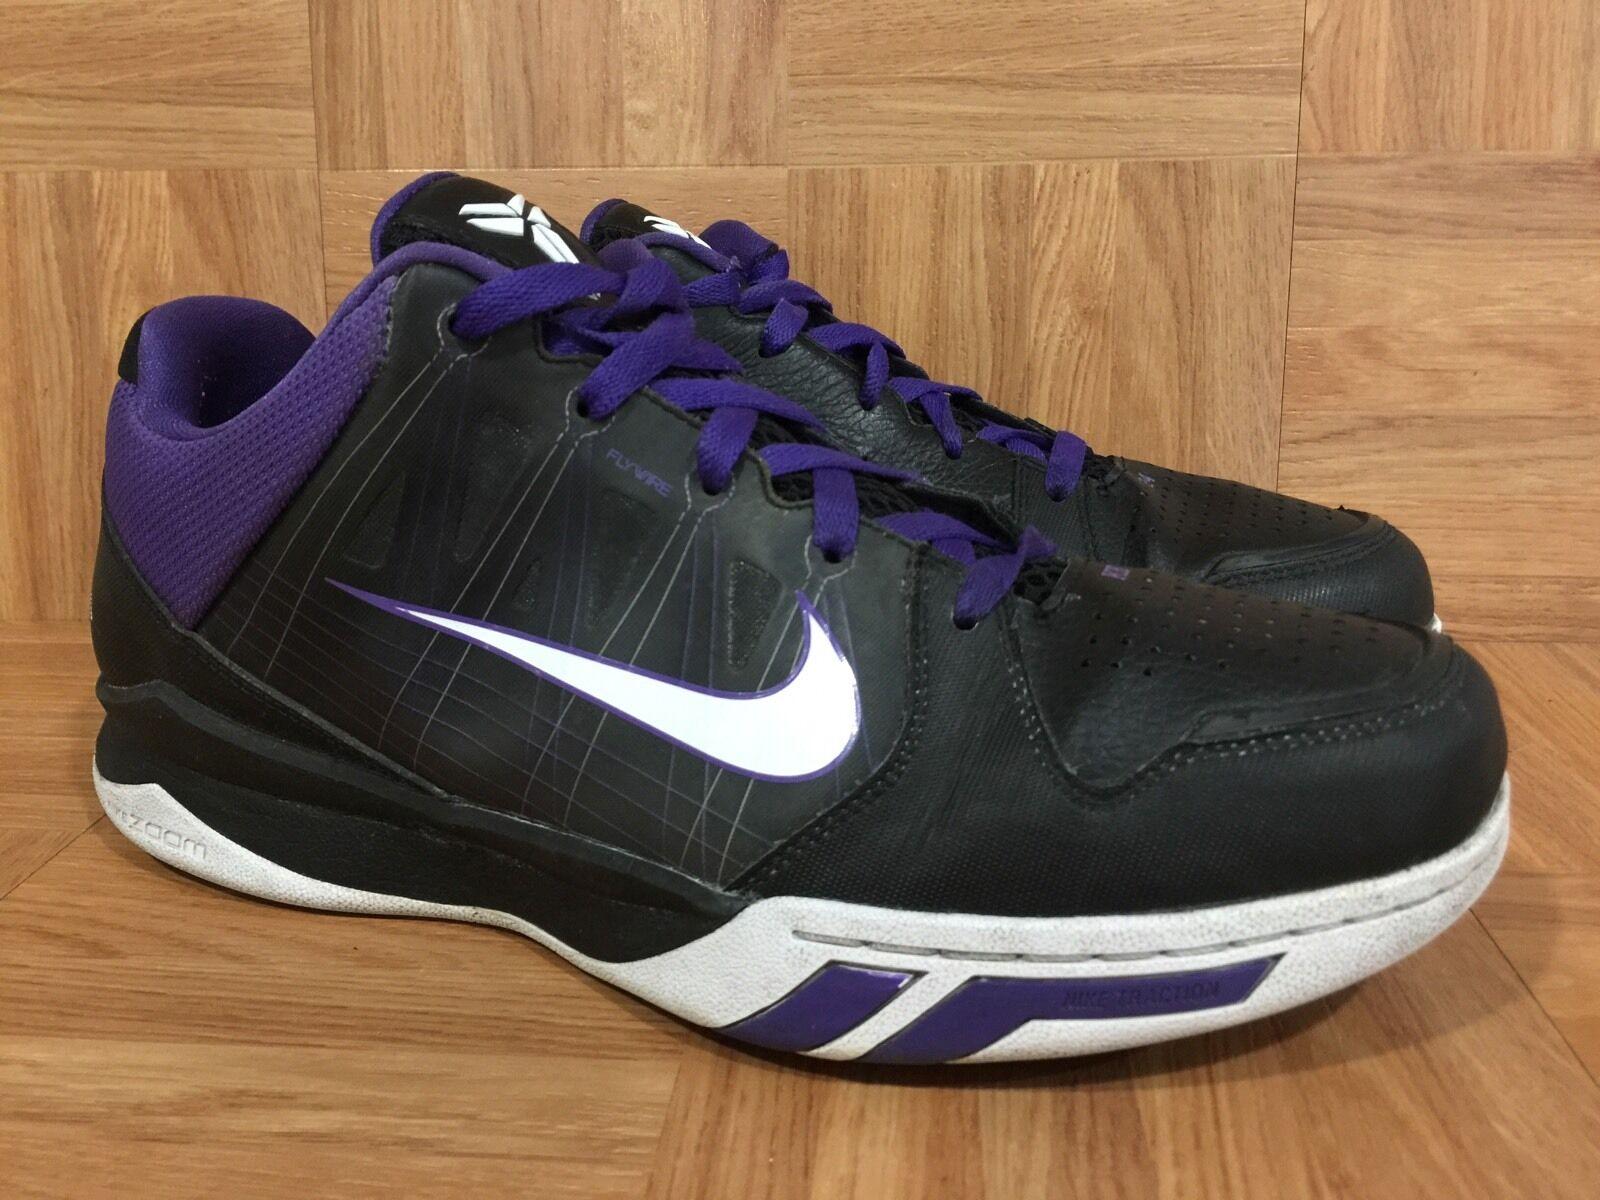 RARE Nike Kobe Dream Season II Black Leather Varsity Purple Sz 11 407624-101